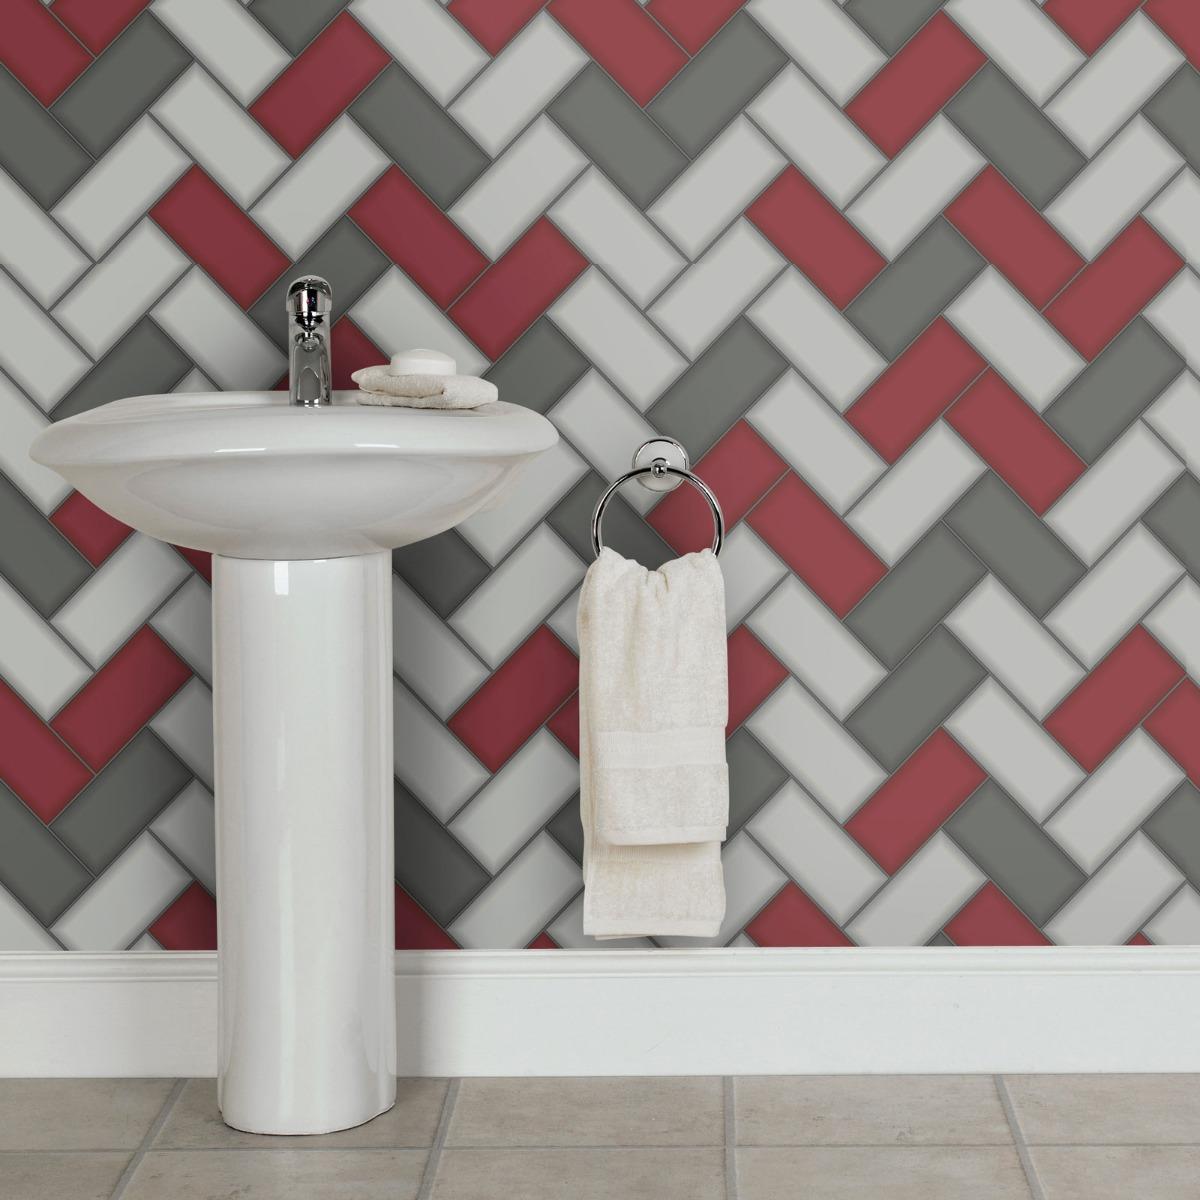 Tiling on a Roll Chevron Tile Wallpaper - Red Holden 89303